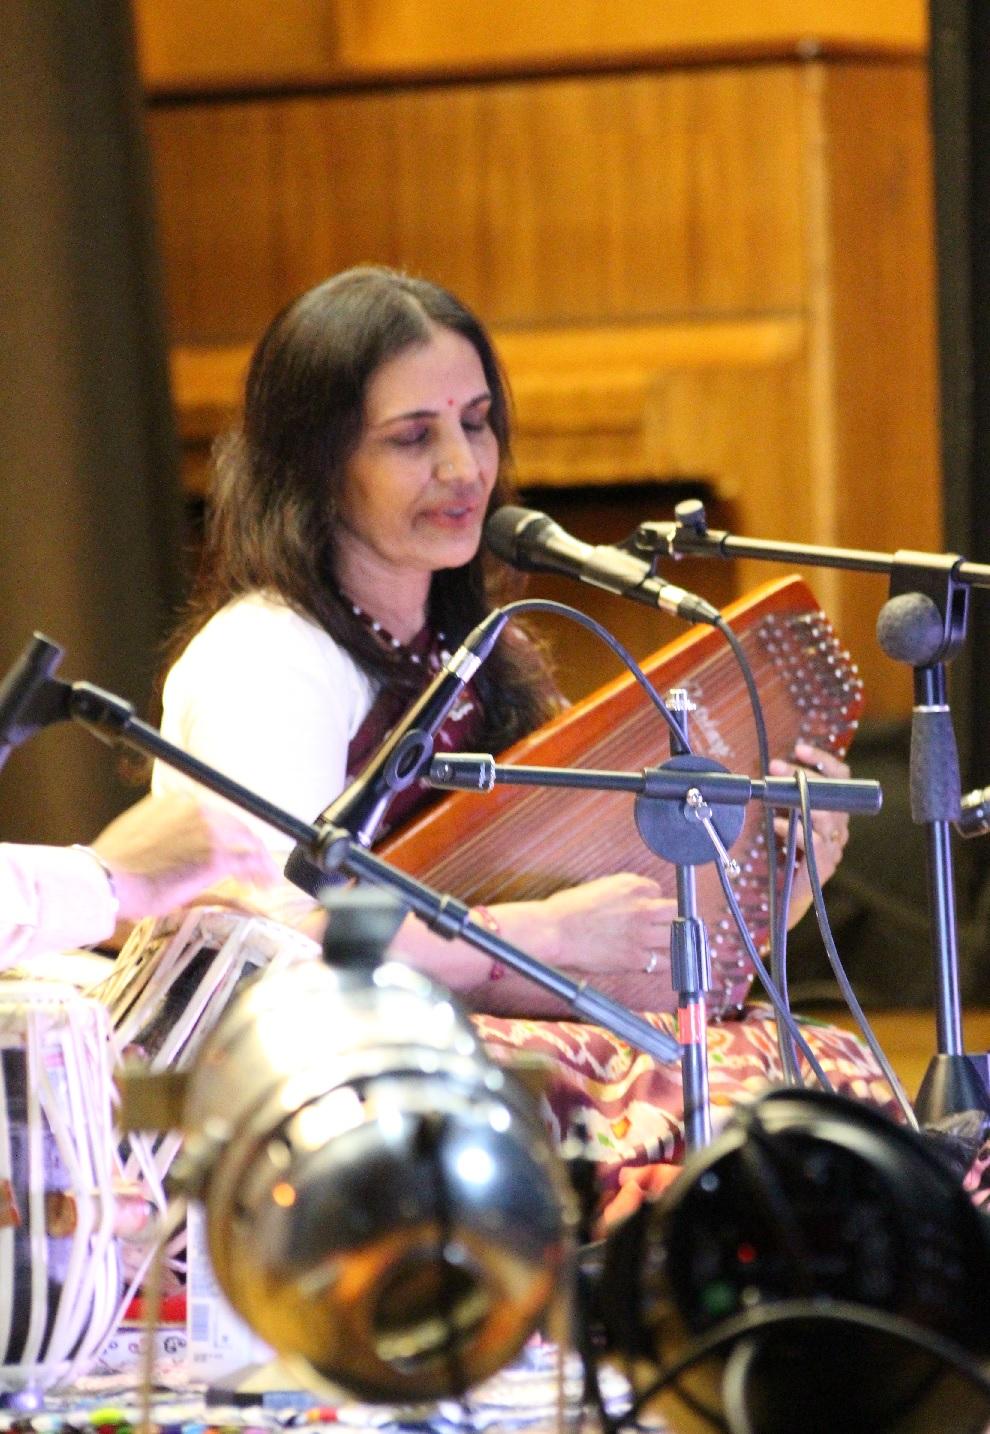 Shweta Jhaveri | Official website | Indian Classical Vocalist